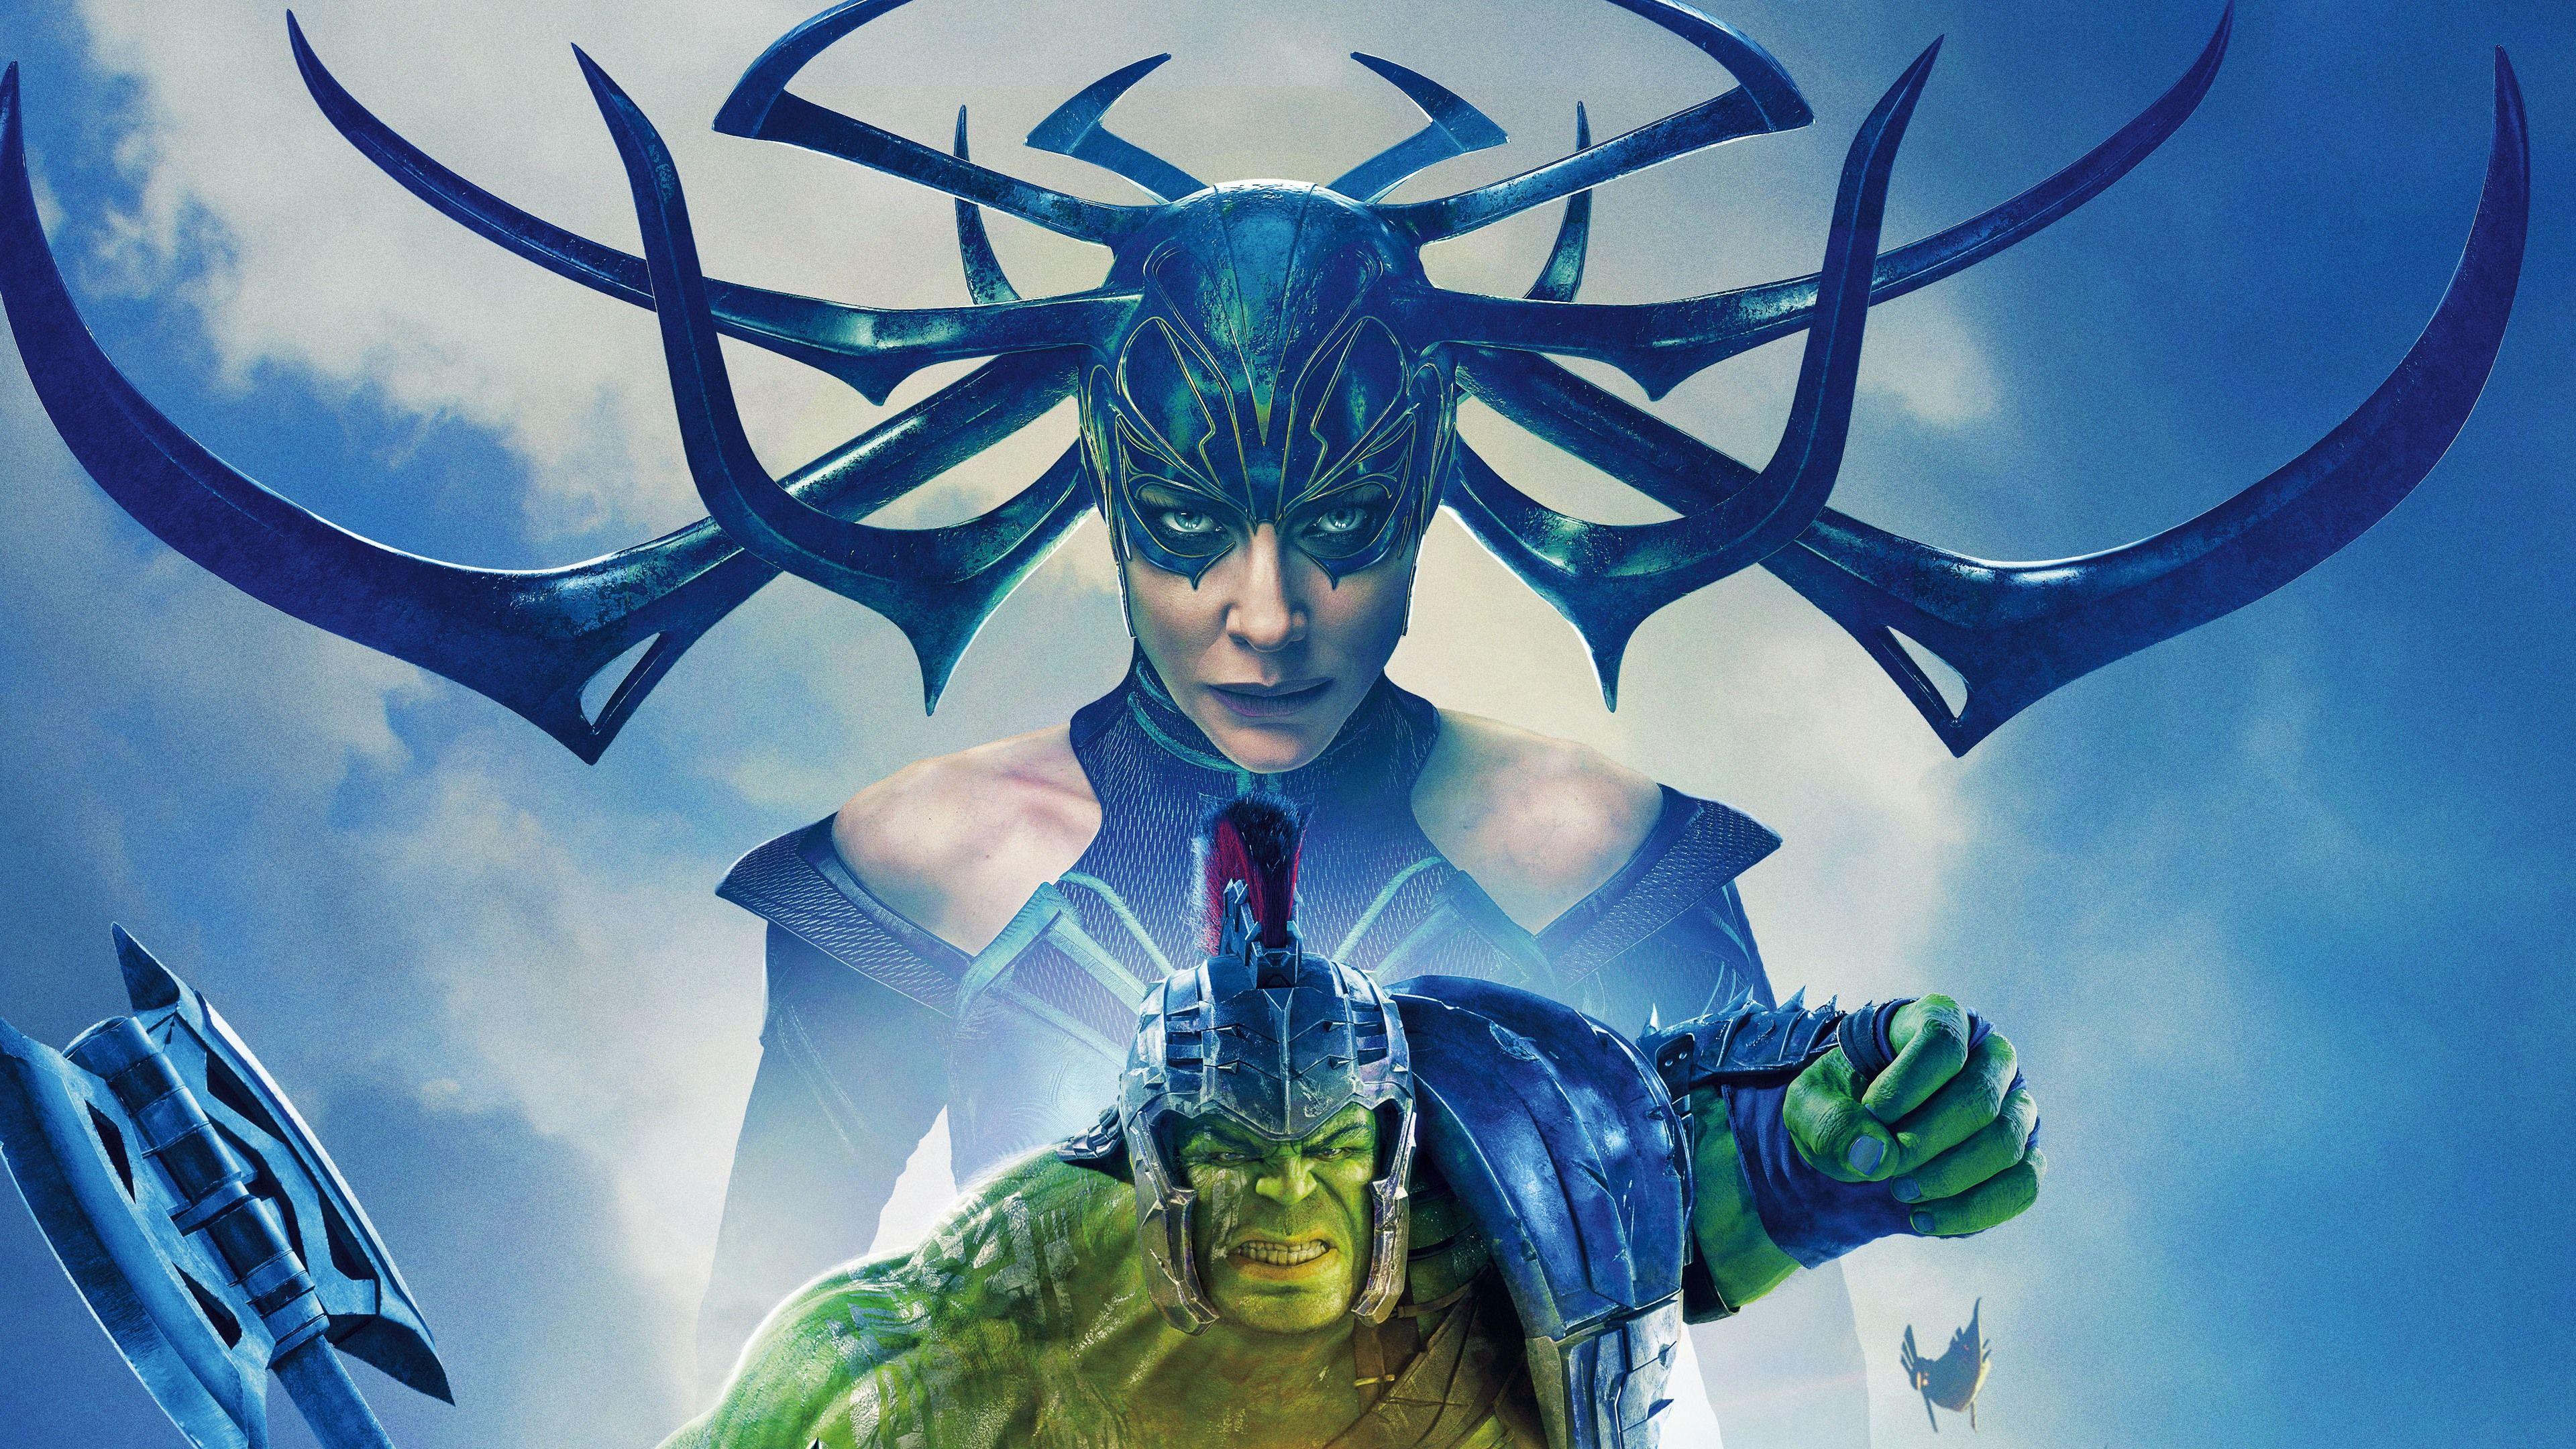 Uhd 4k Thor Ragnarok Cate Blanchette Hela And Mark Ruffalo